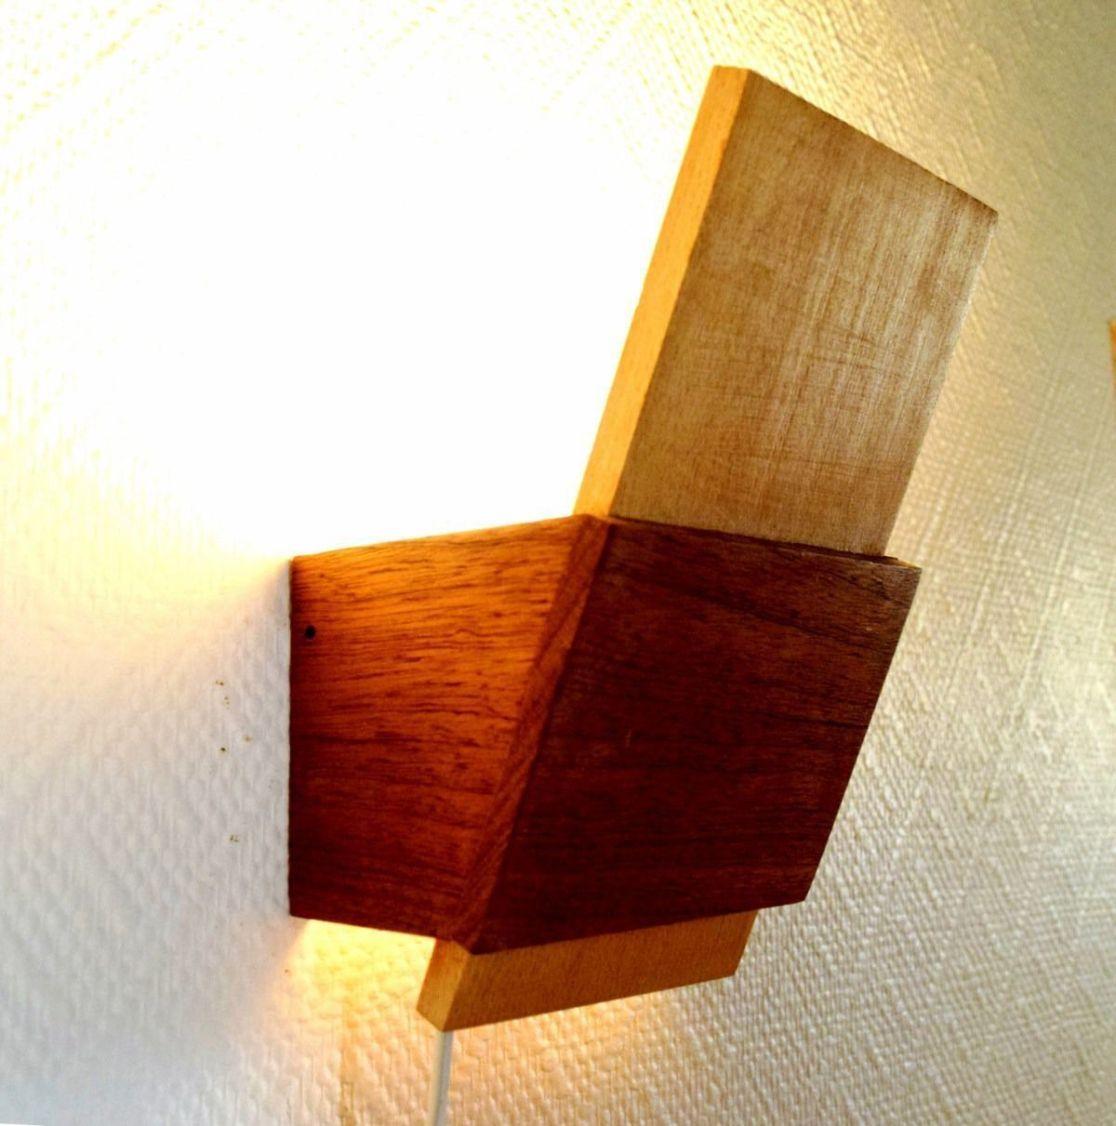 16 Beautiful Diy Wood Lamps Fancydecors Wall Lamps Diy Wooden Wall Lights Wood Lamps